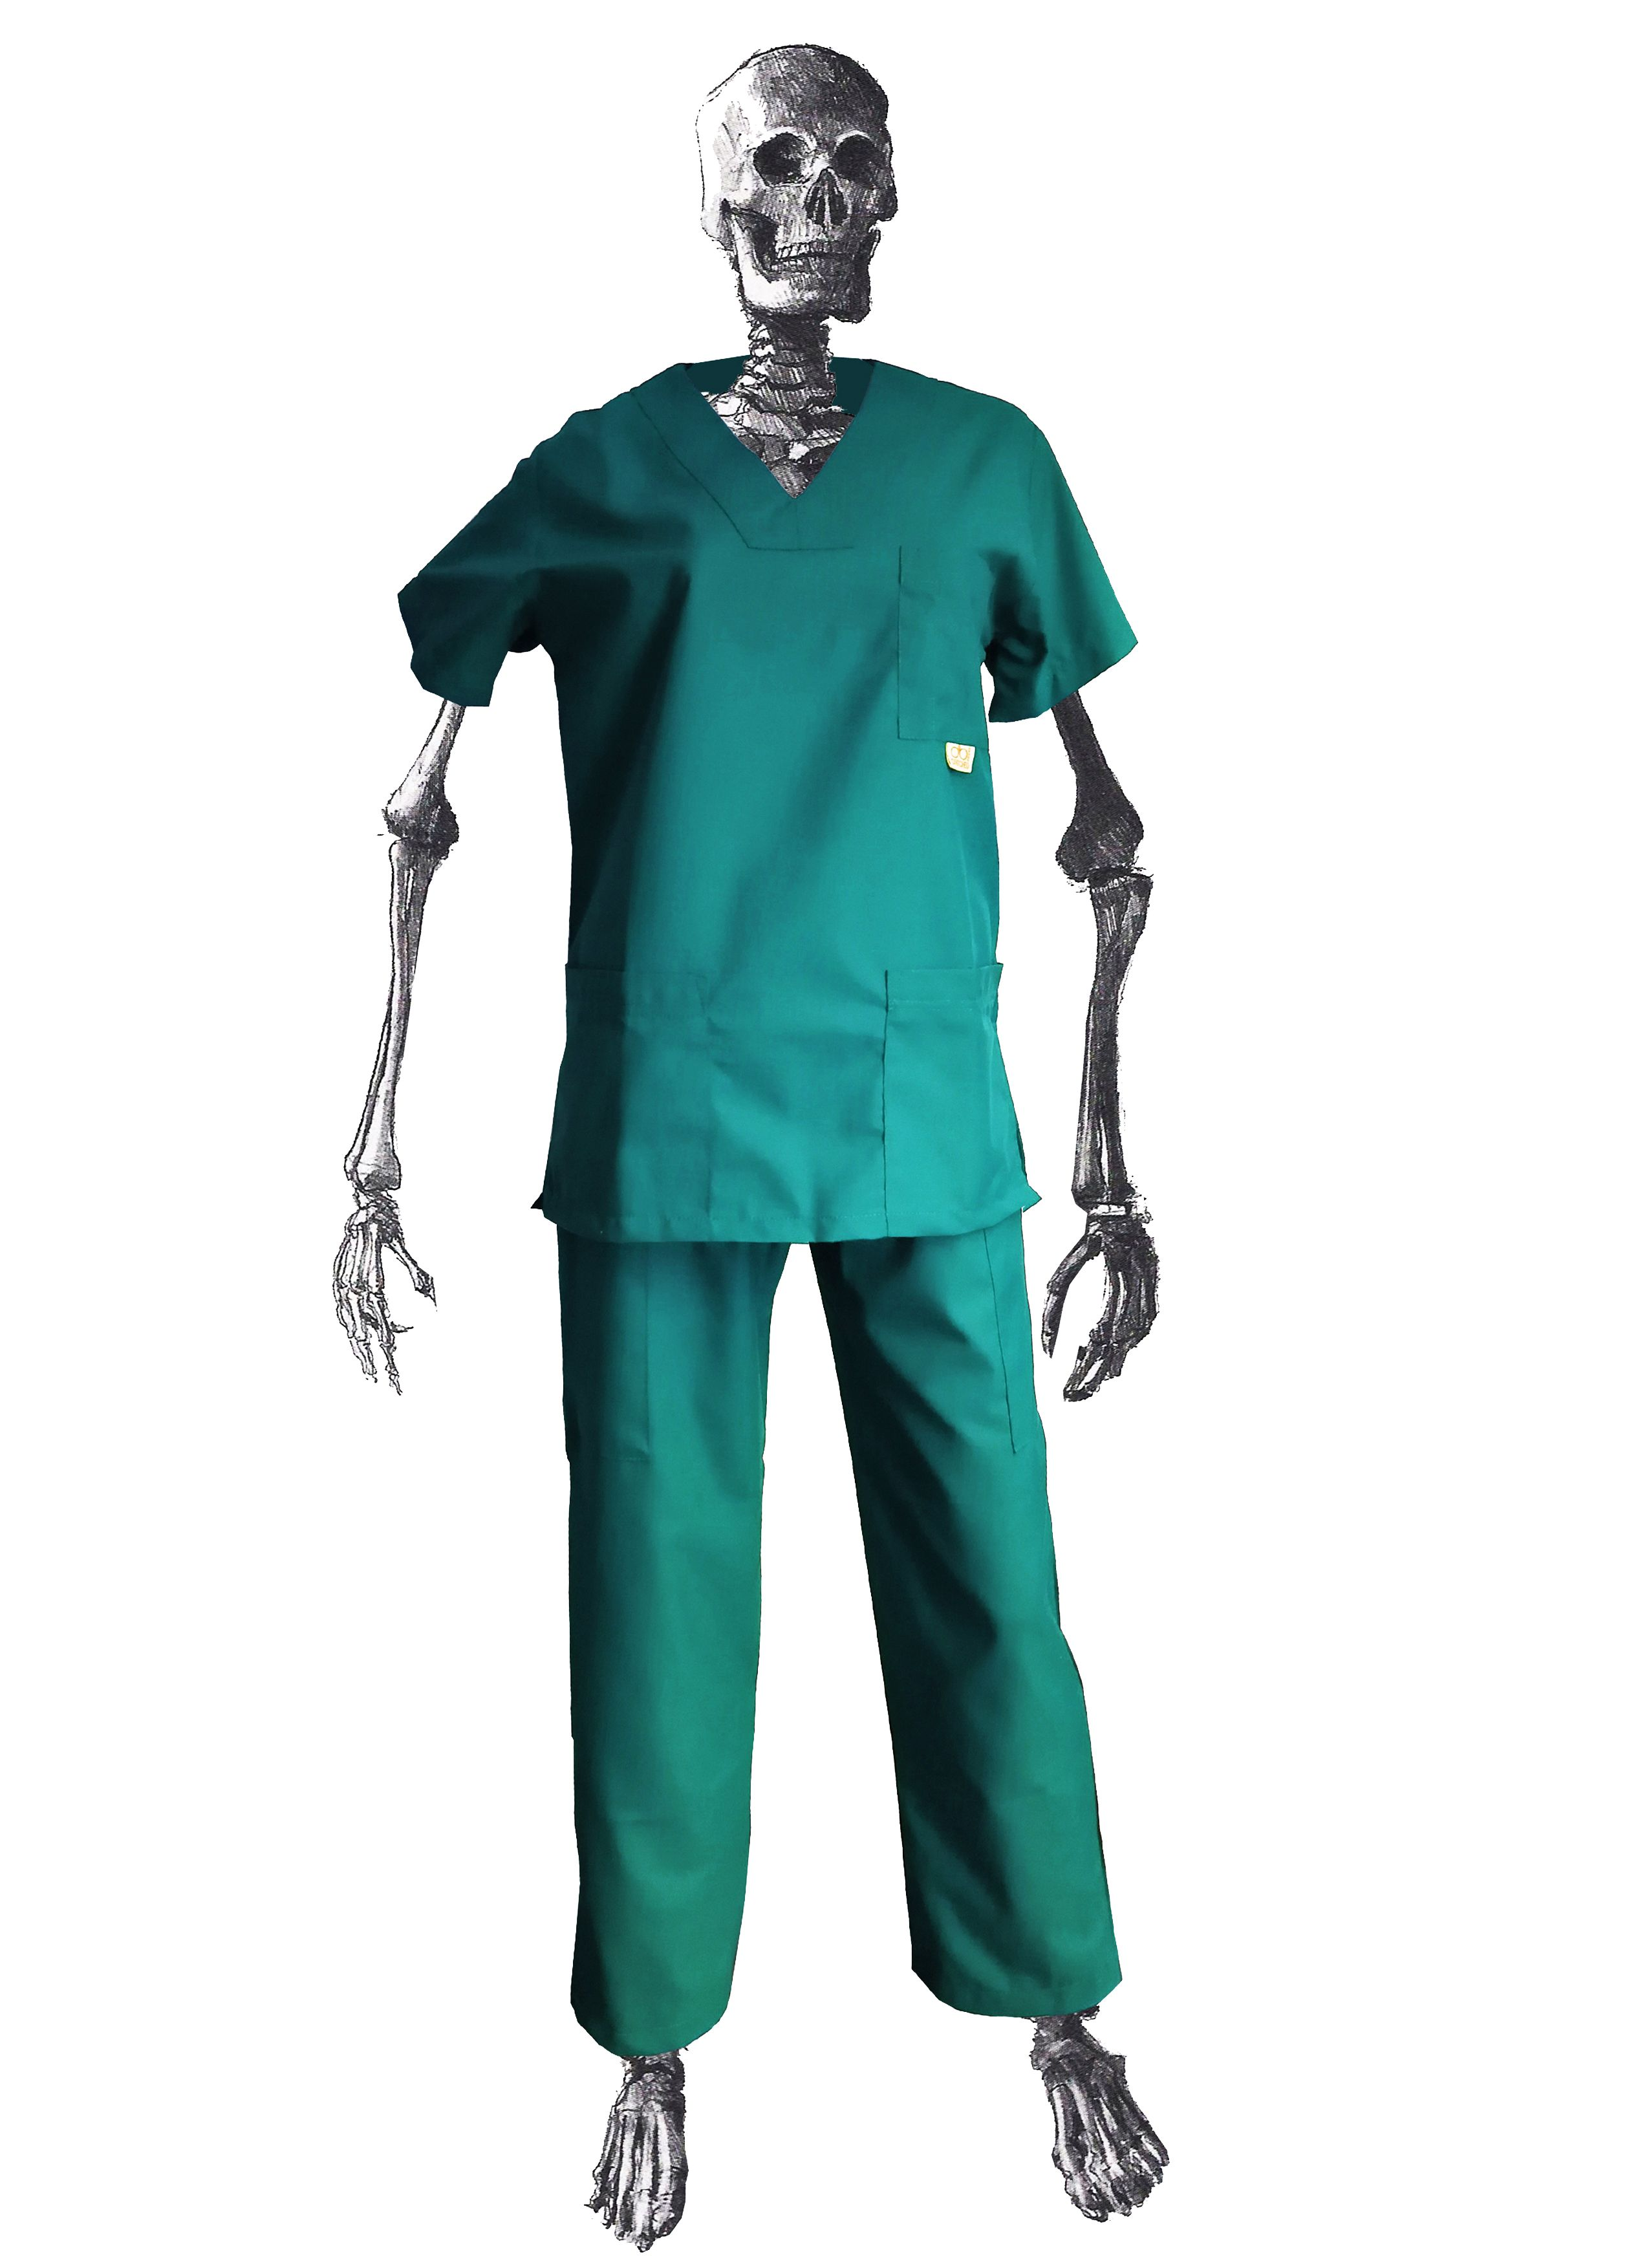 Jade scrub set Medical scrubs, Scrubs, Scrub sets